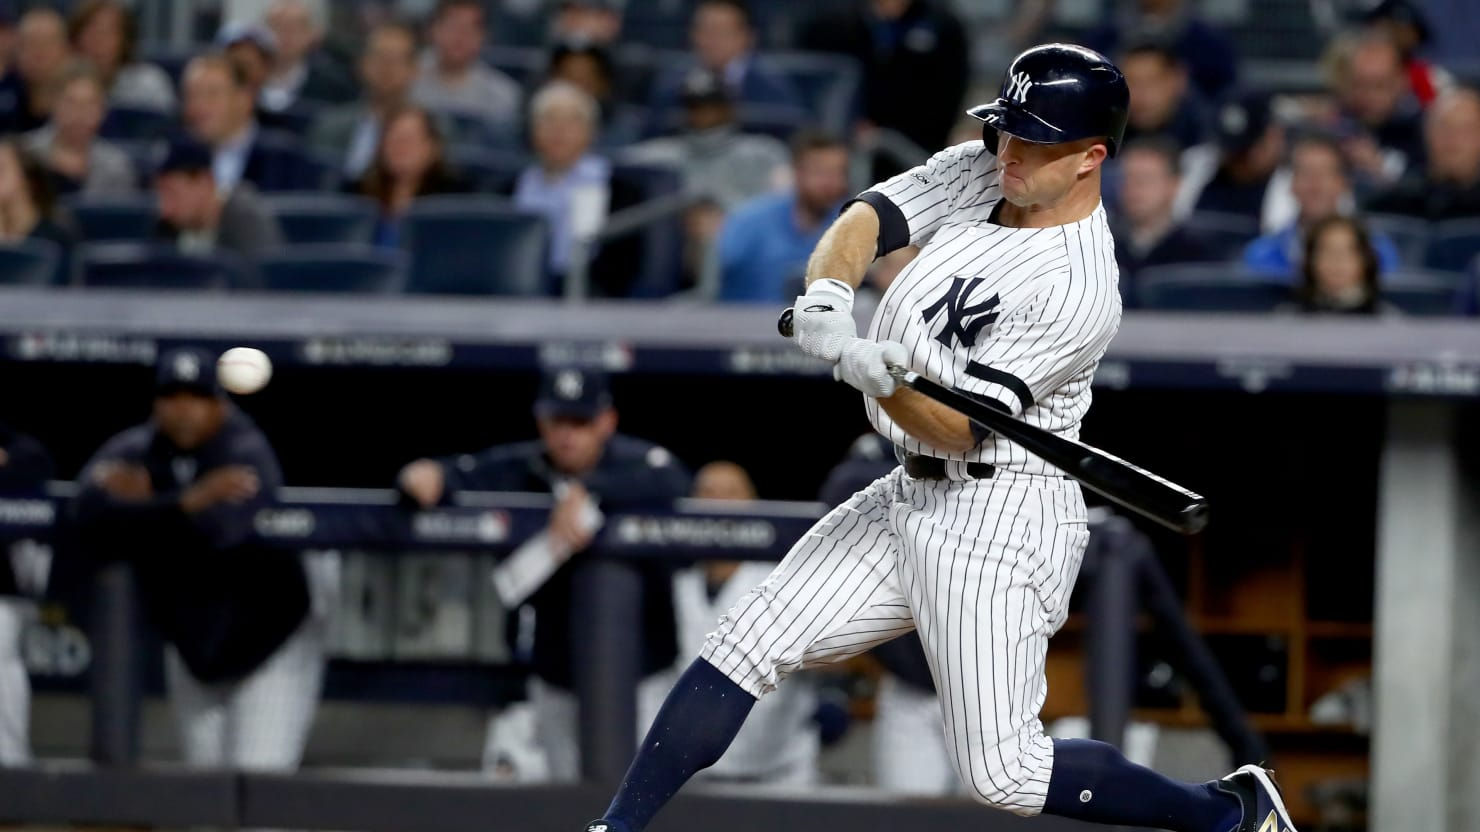 Yankees' Brett Gardner Seeks Protection Order Against Obsessed Fan